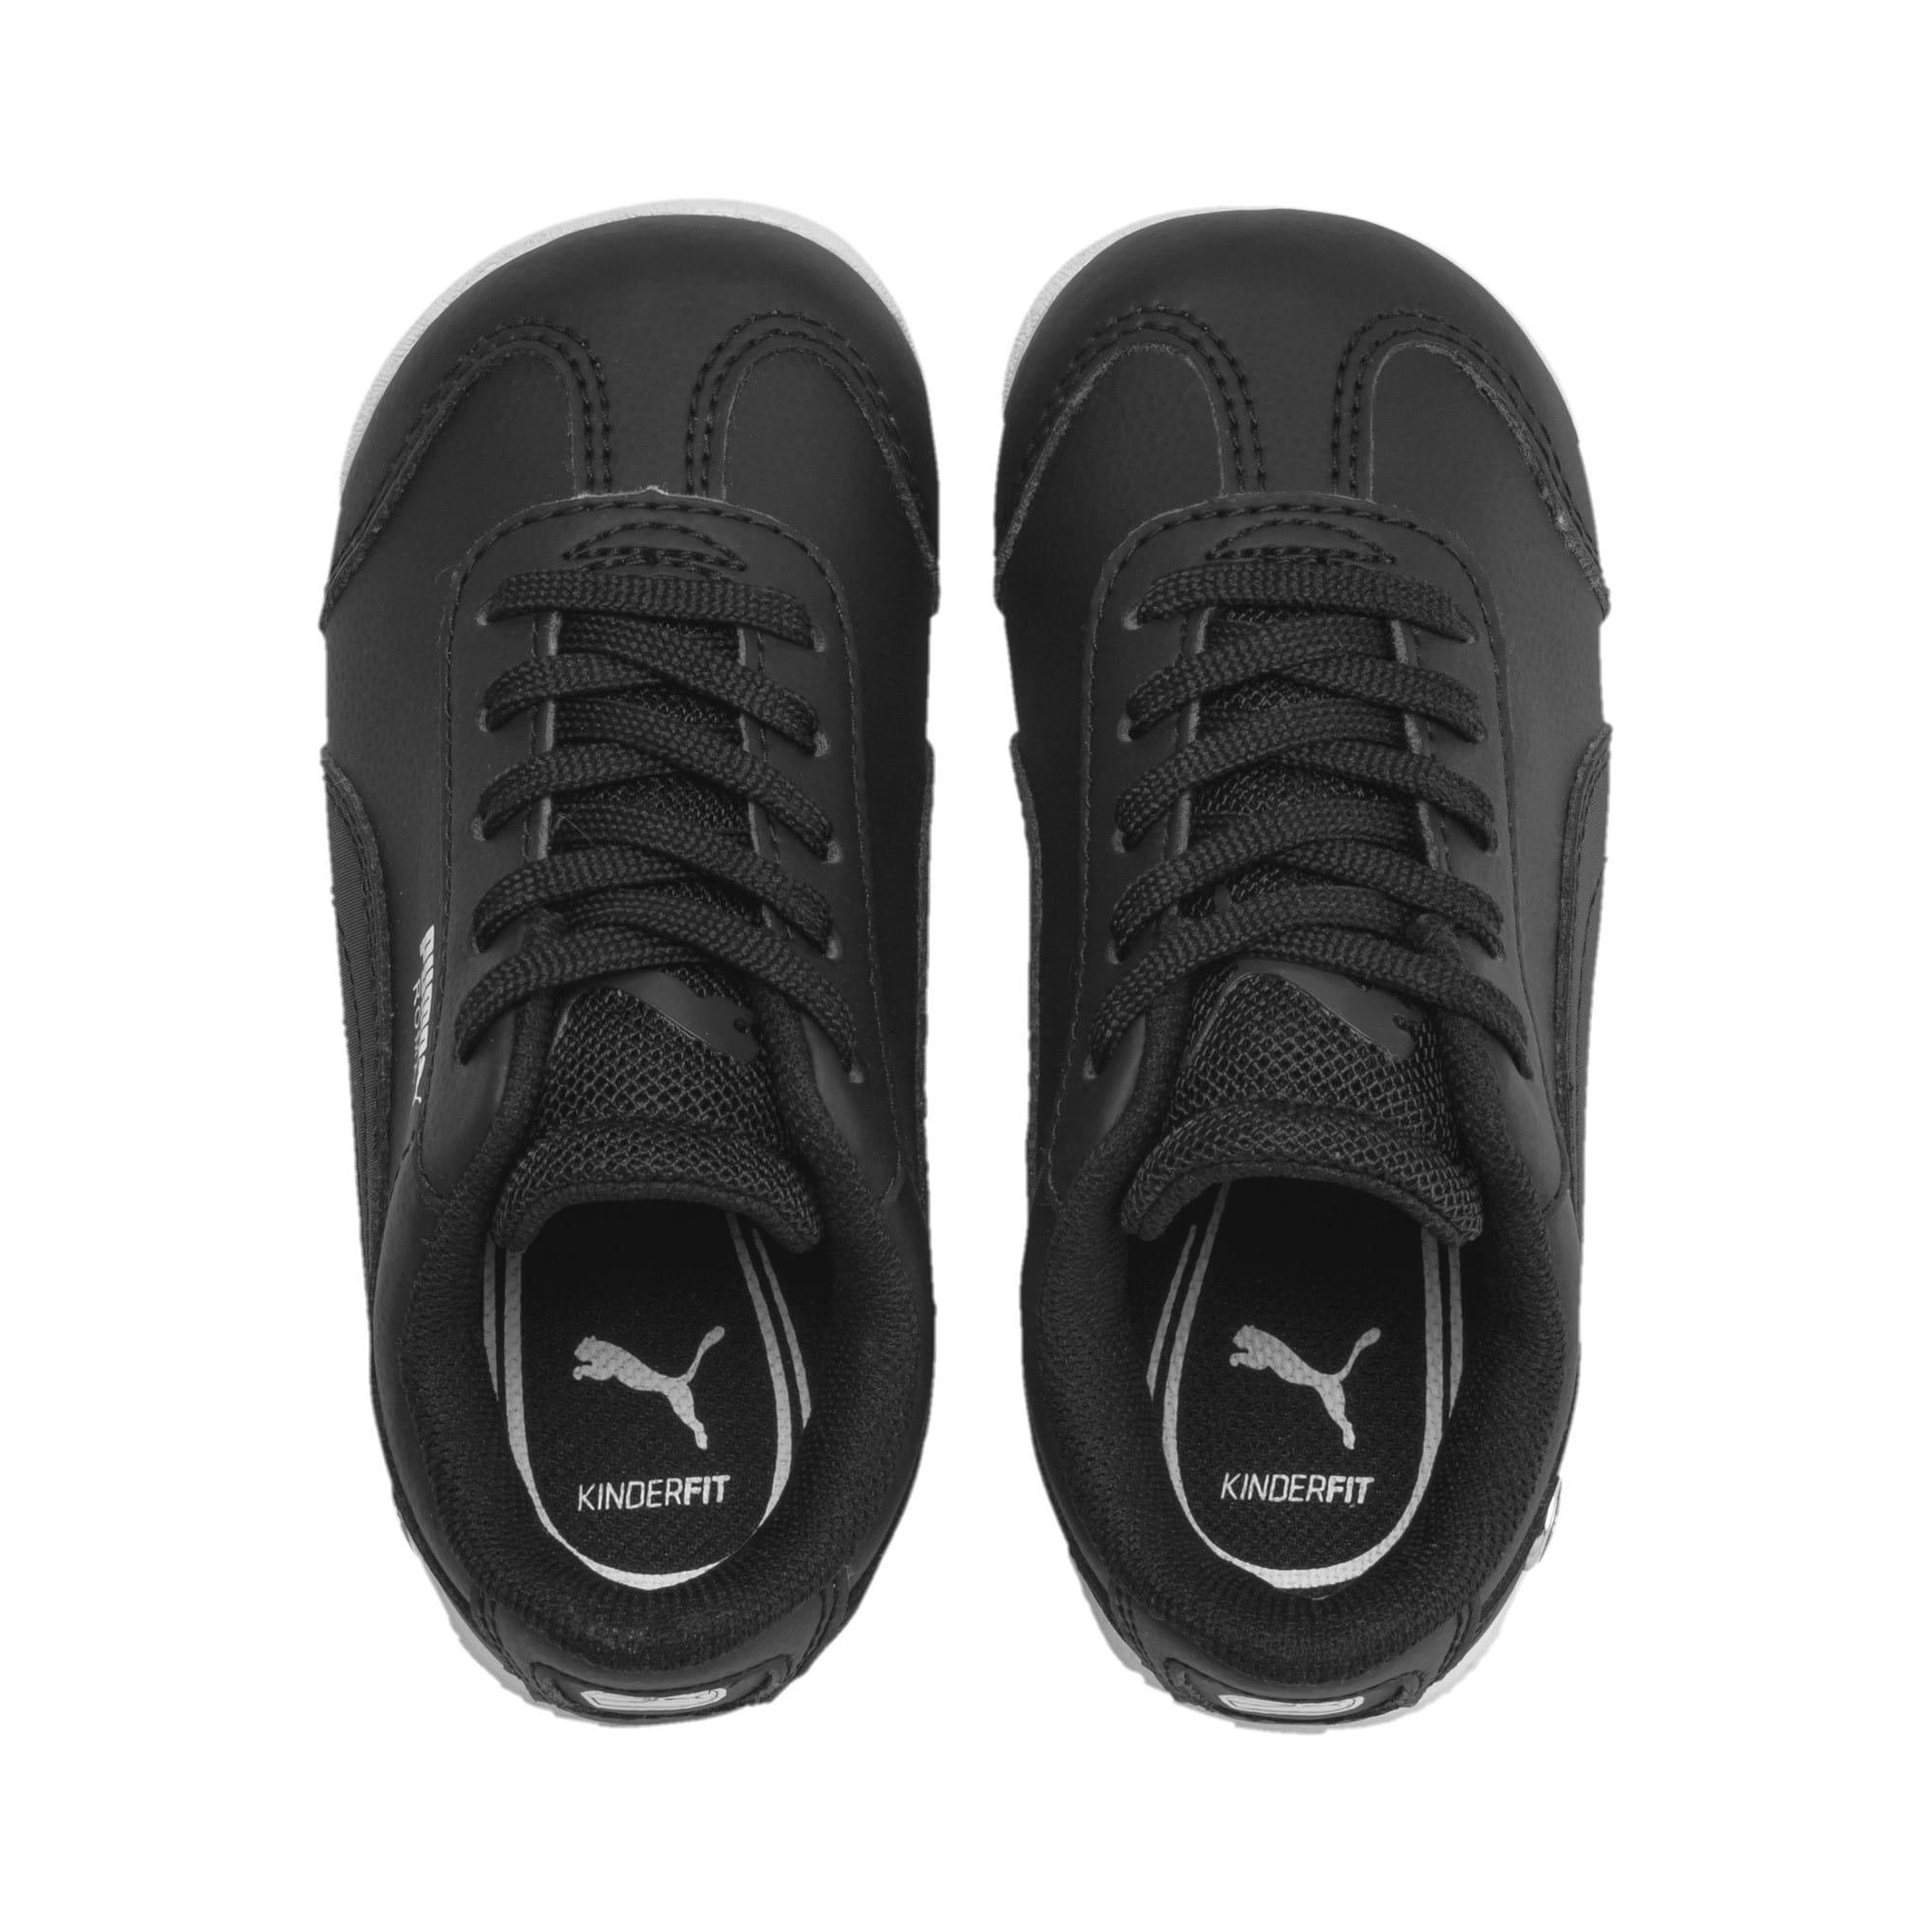 Thumbnail 6 of BMW M Motorsport Roma Toddler Shoes, Puma Black-Puma Black, medium